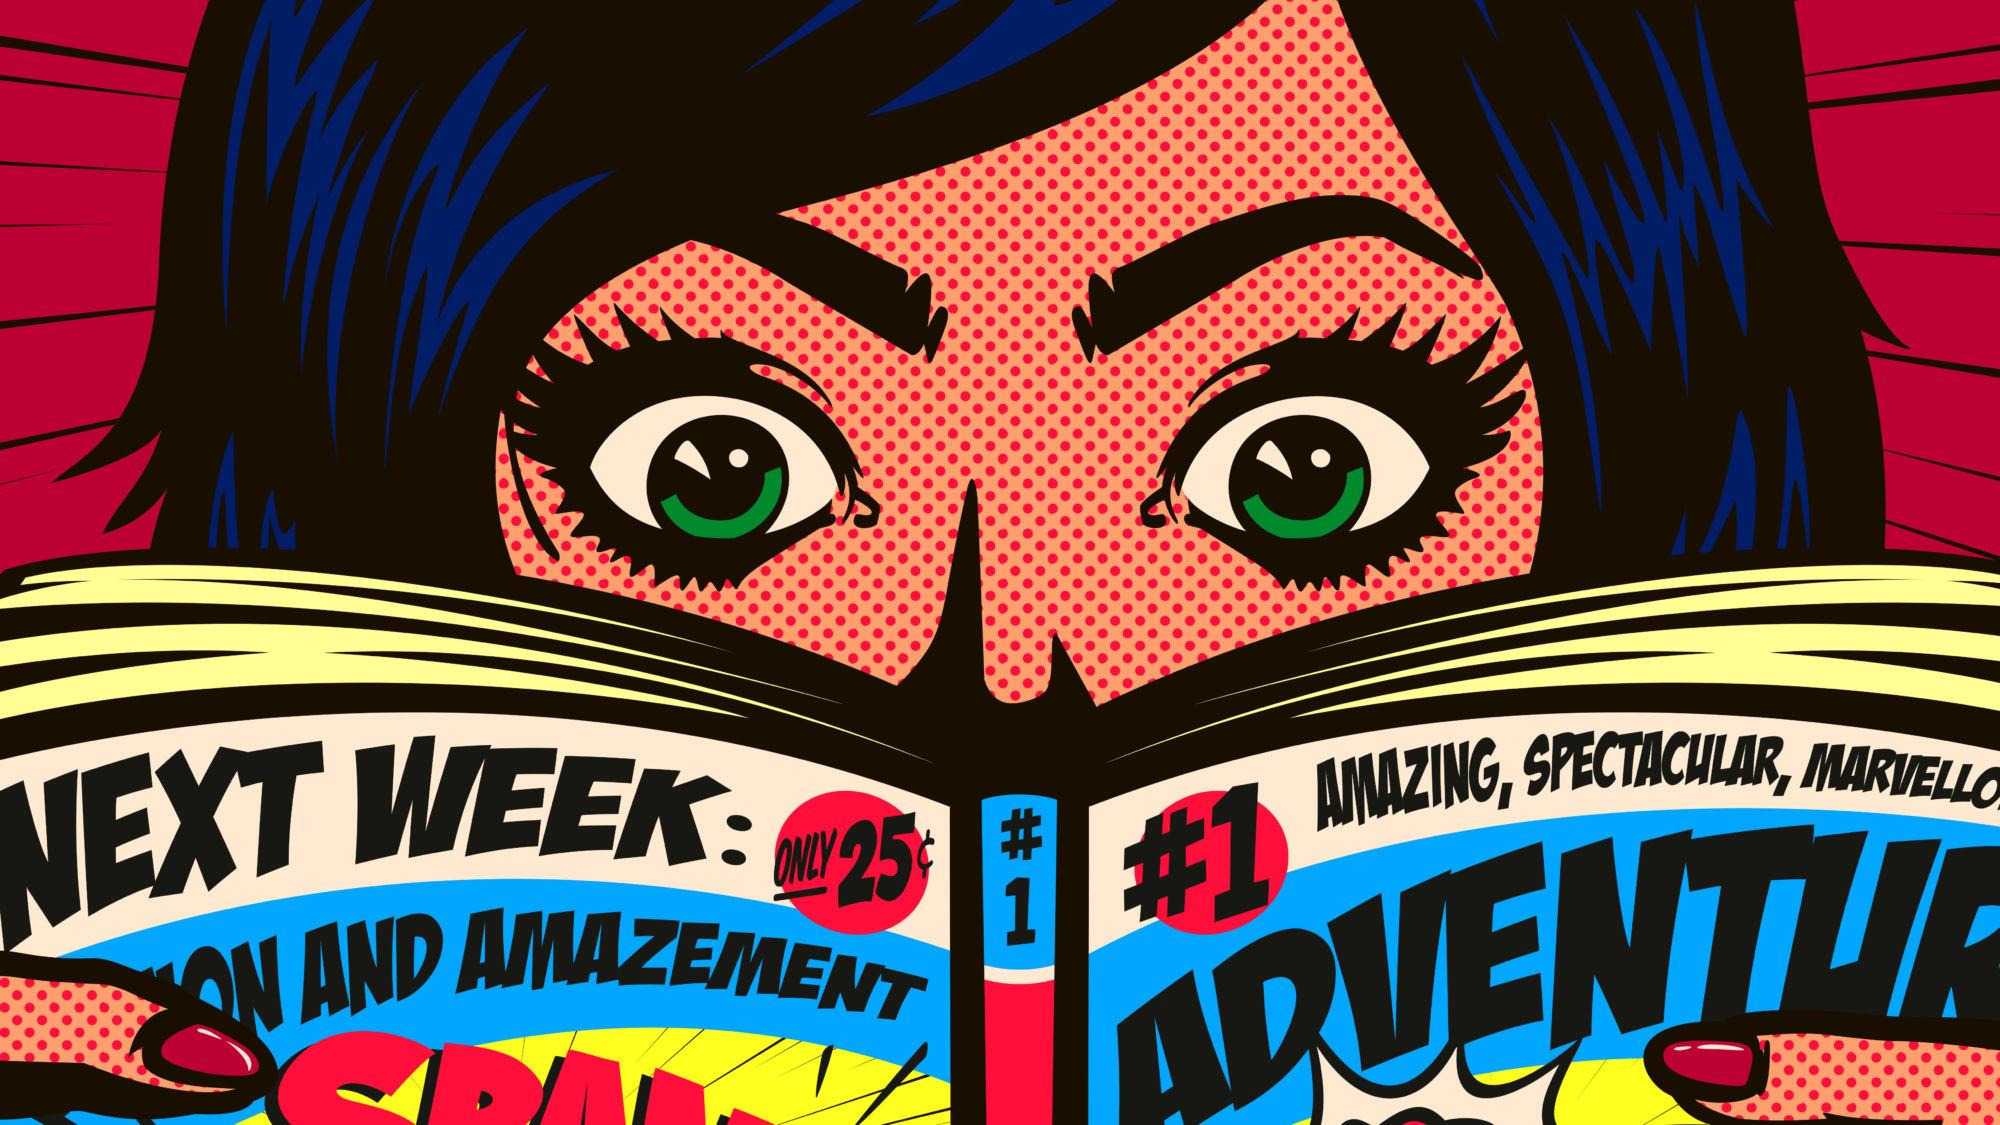 Comics: Comic Book News, Rumors & Information - Bleeding Cool Page 1